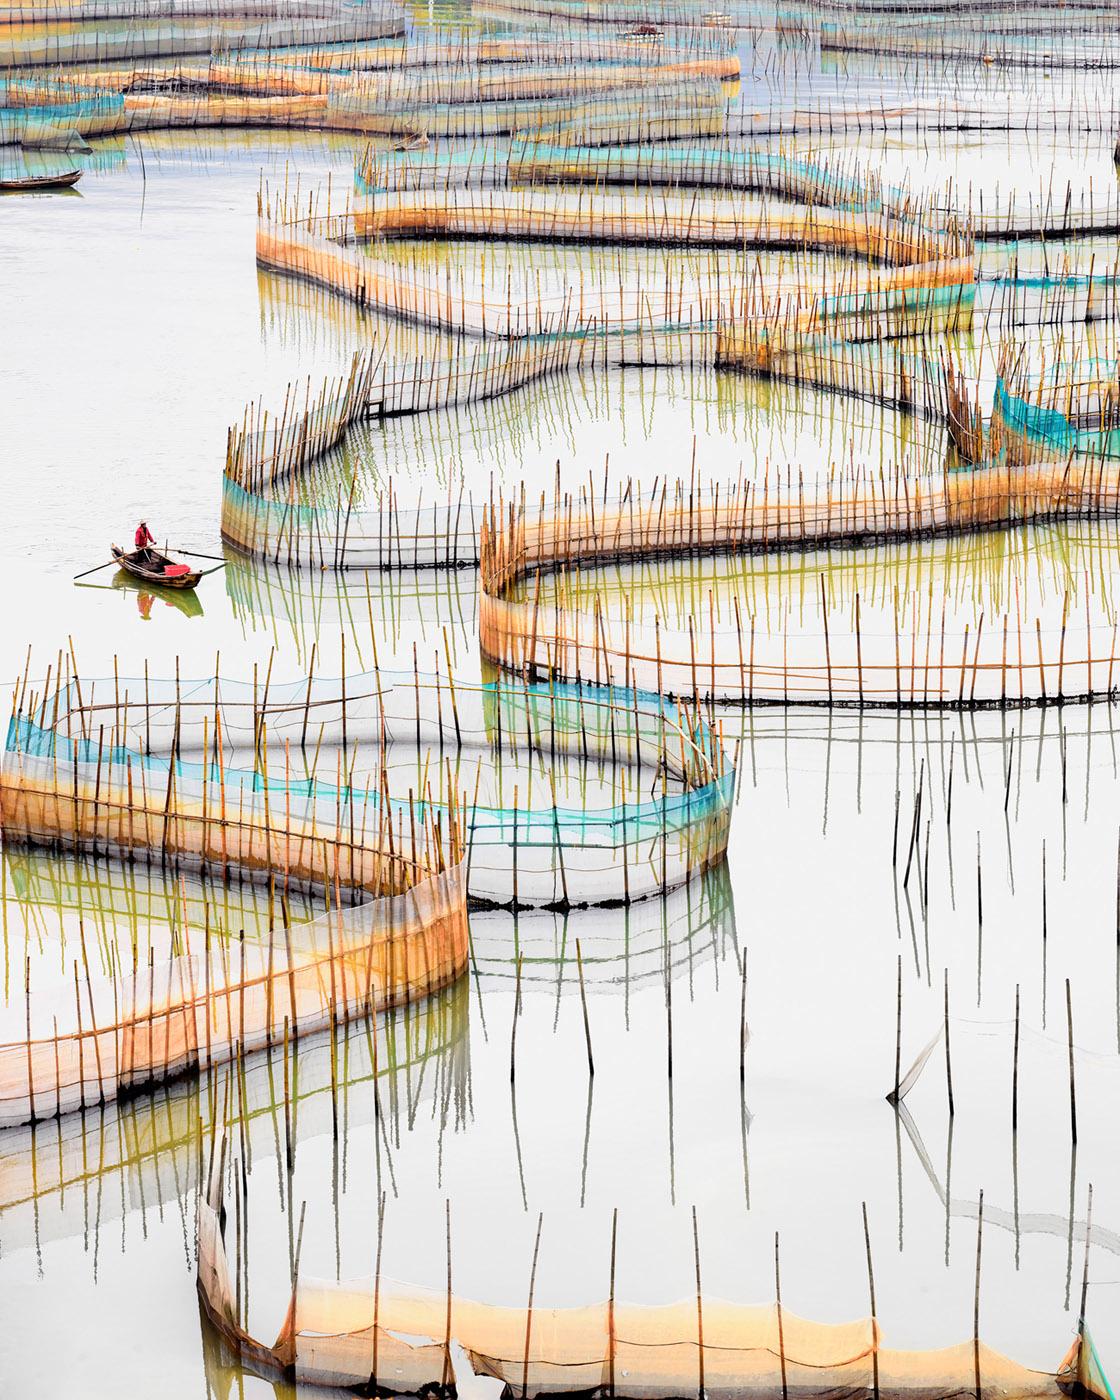 David Burdeny Nets (vertical), Ningde, Fujian, People's Republic of China, 2017